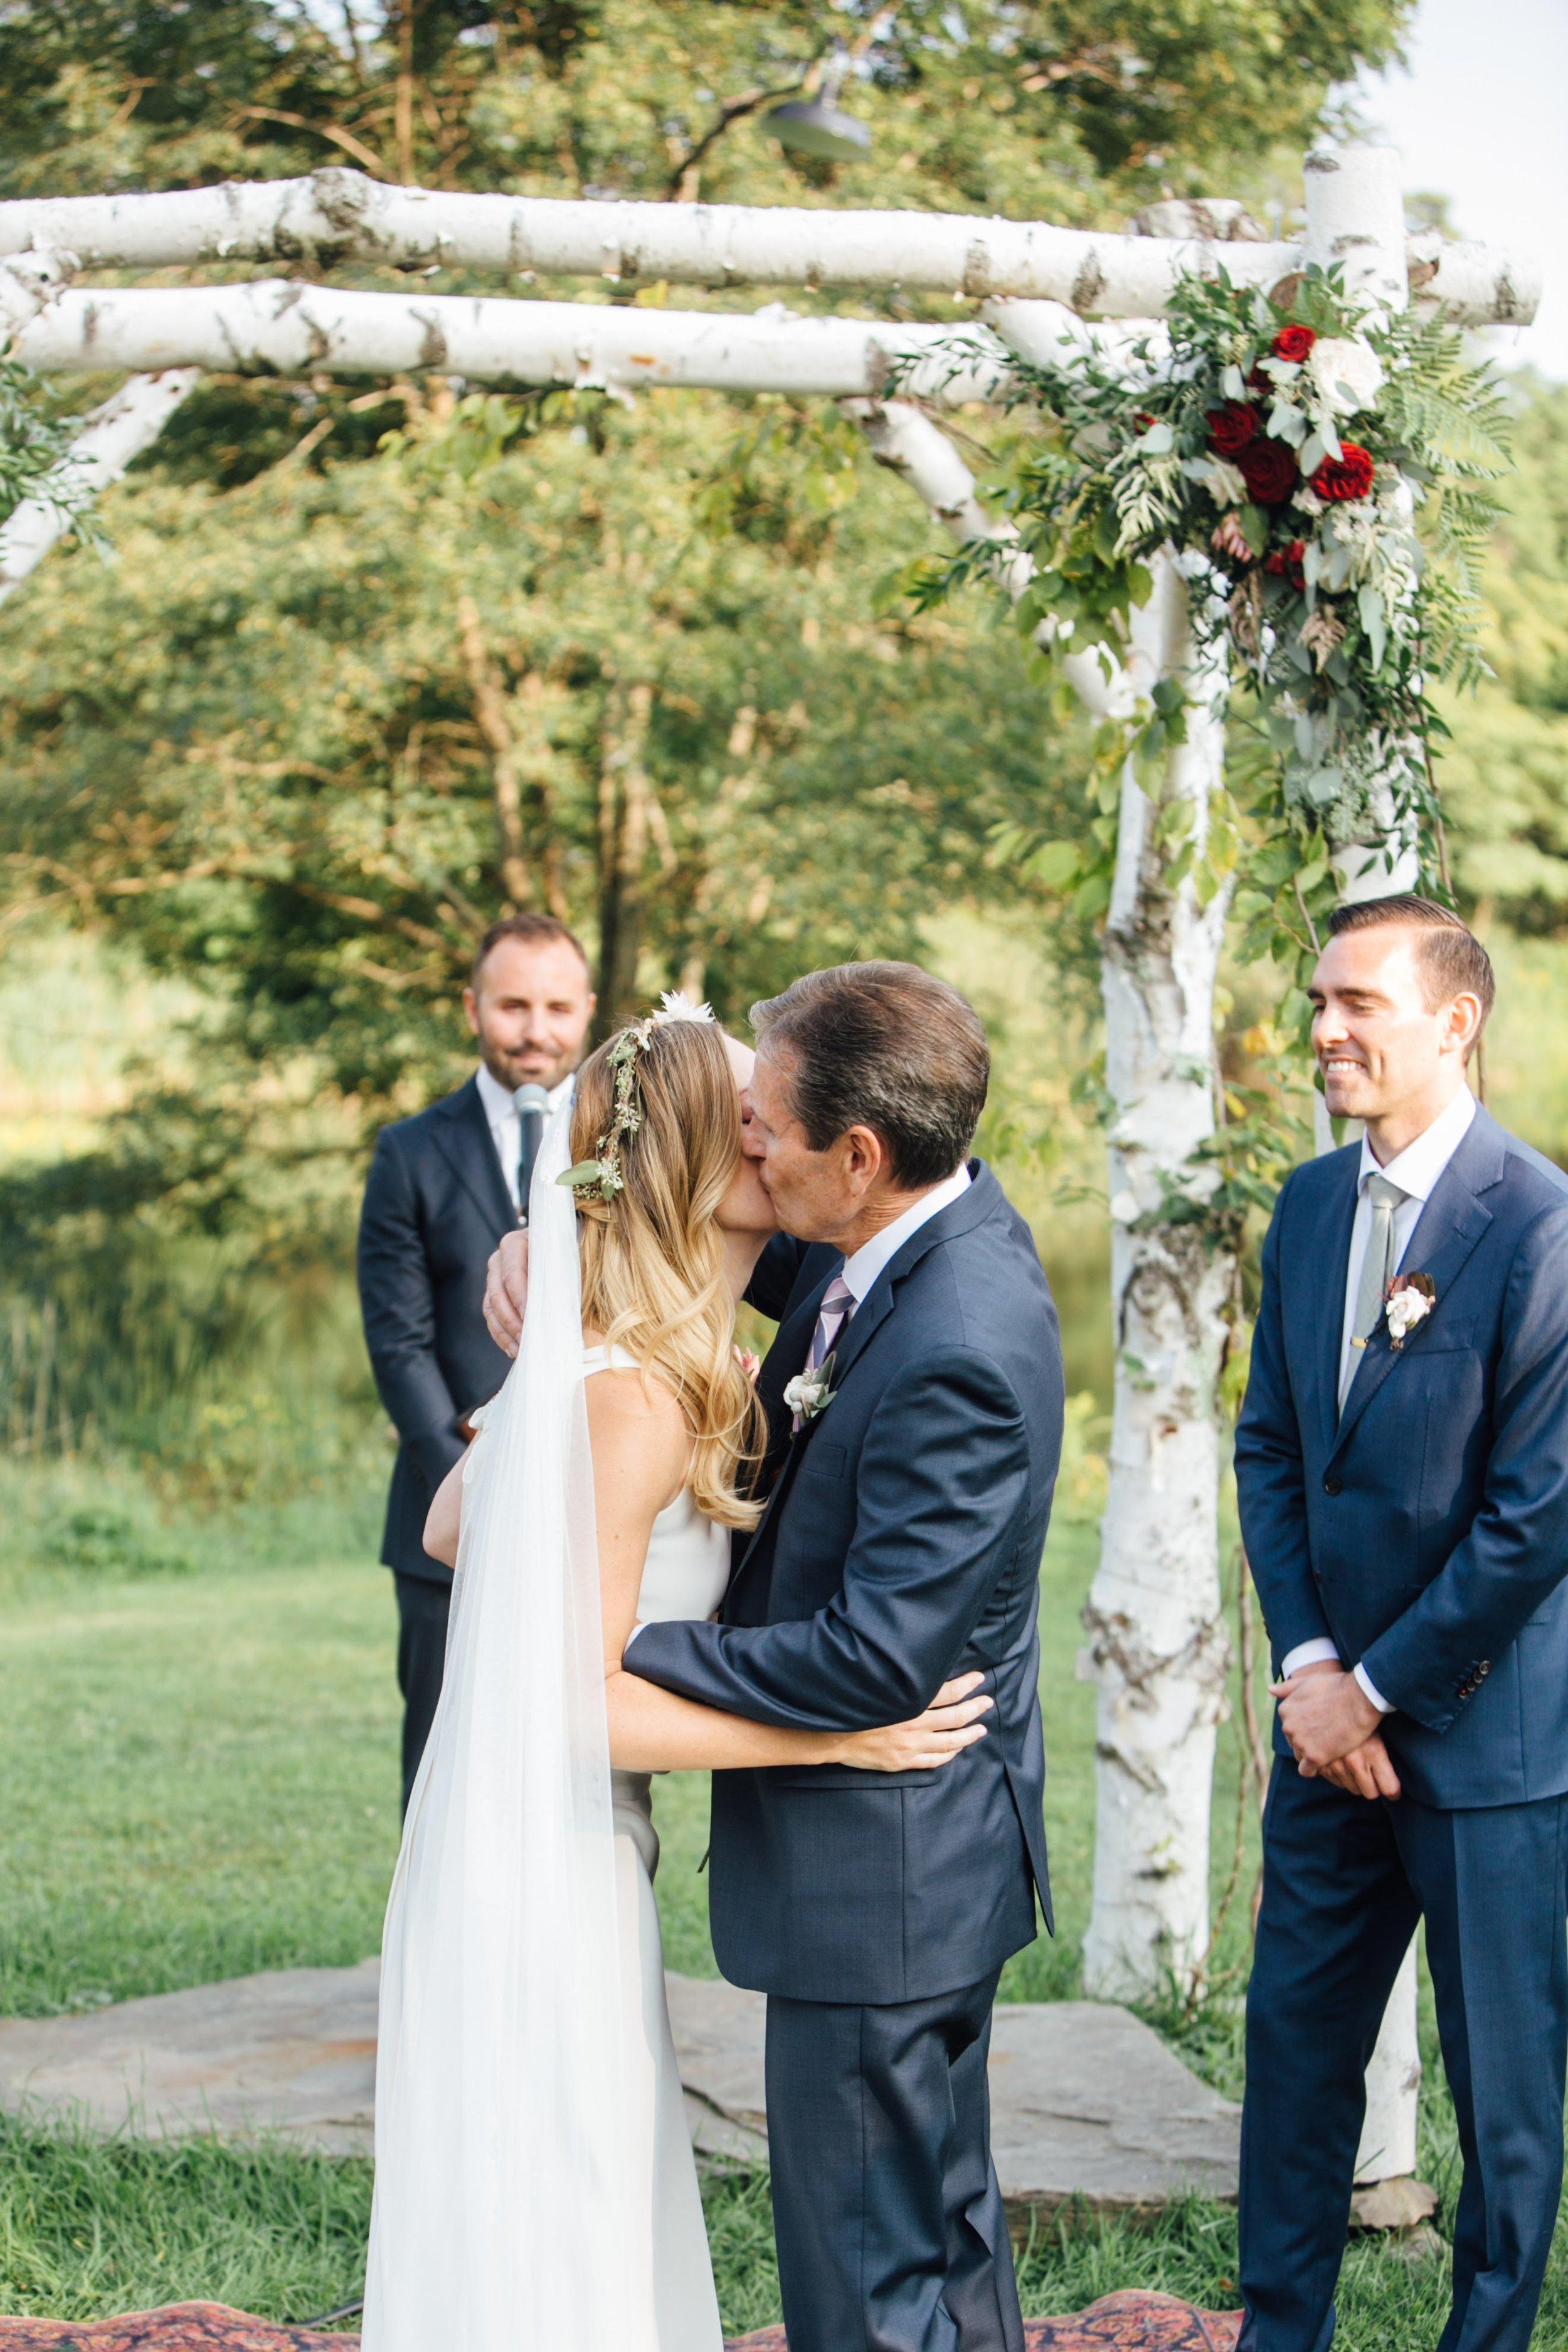 Courtney + Matt Blenheim Hill Farm Catskills NY Wedding Veronica Lola Photography 2017-381.jpg